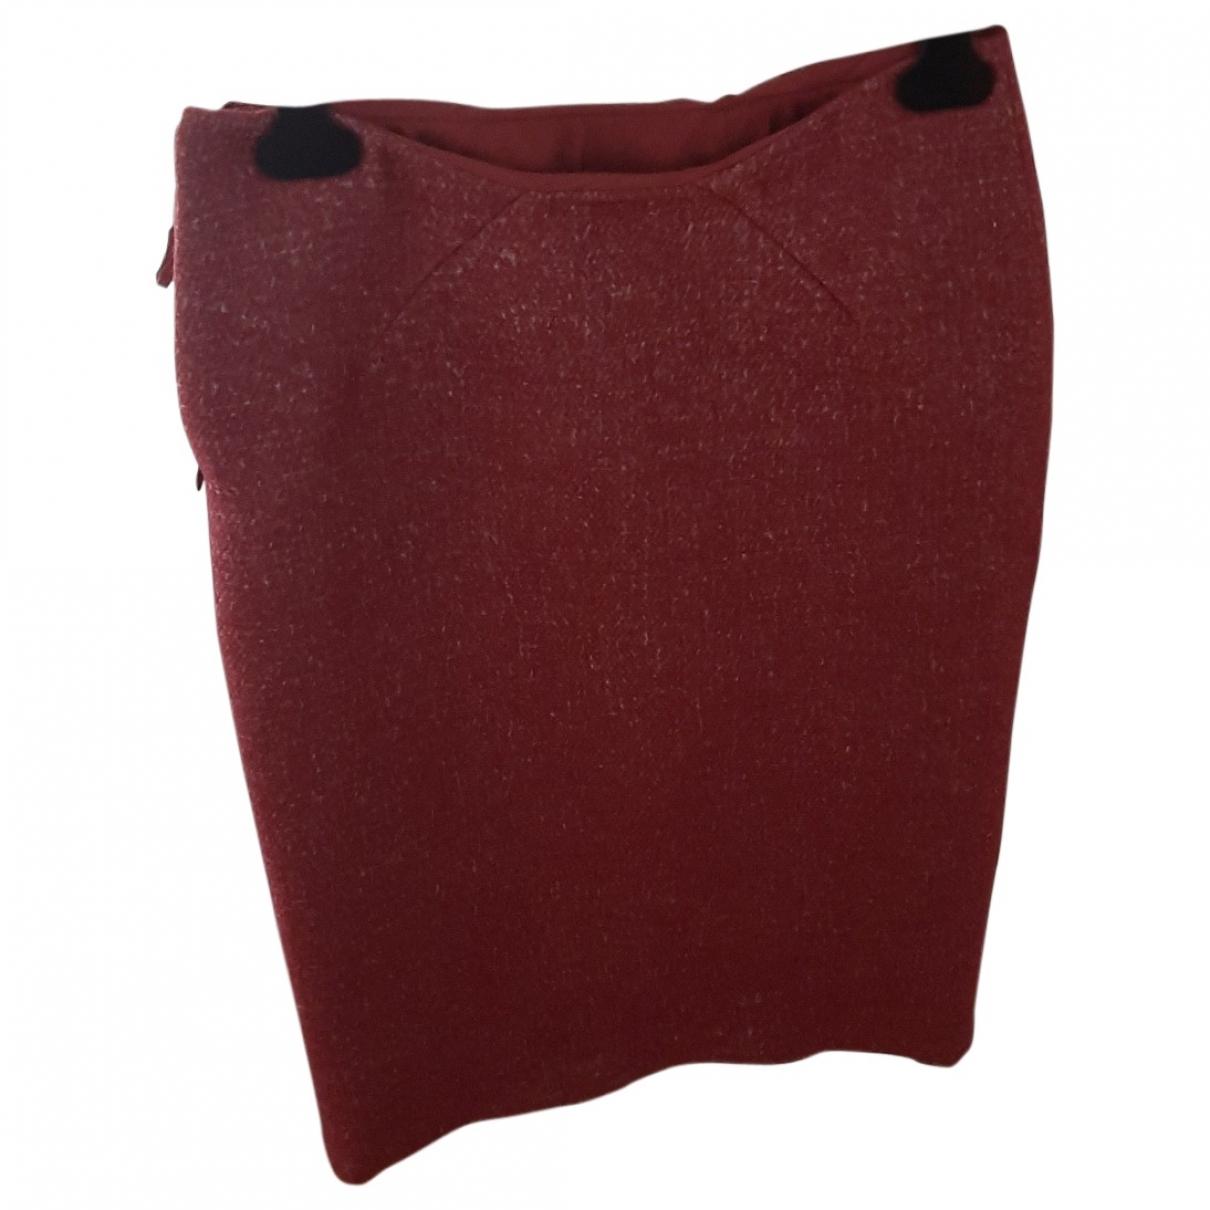 Bottega Veneta - Jupe   pour femme en cachemire - rouge